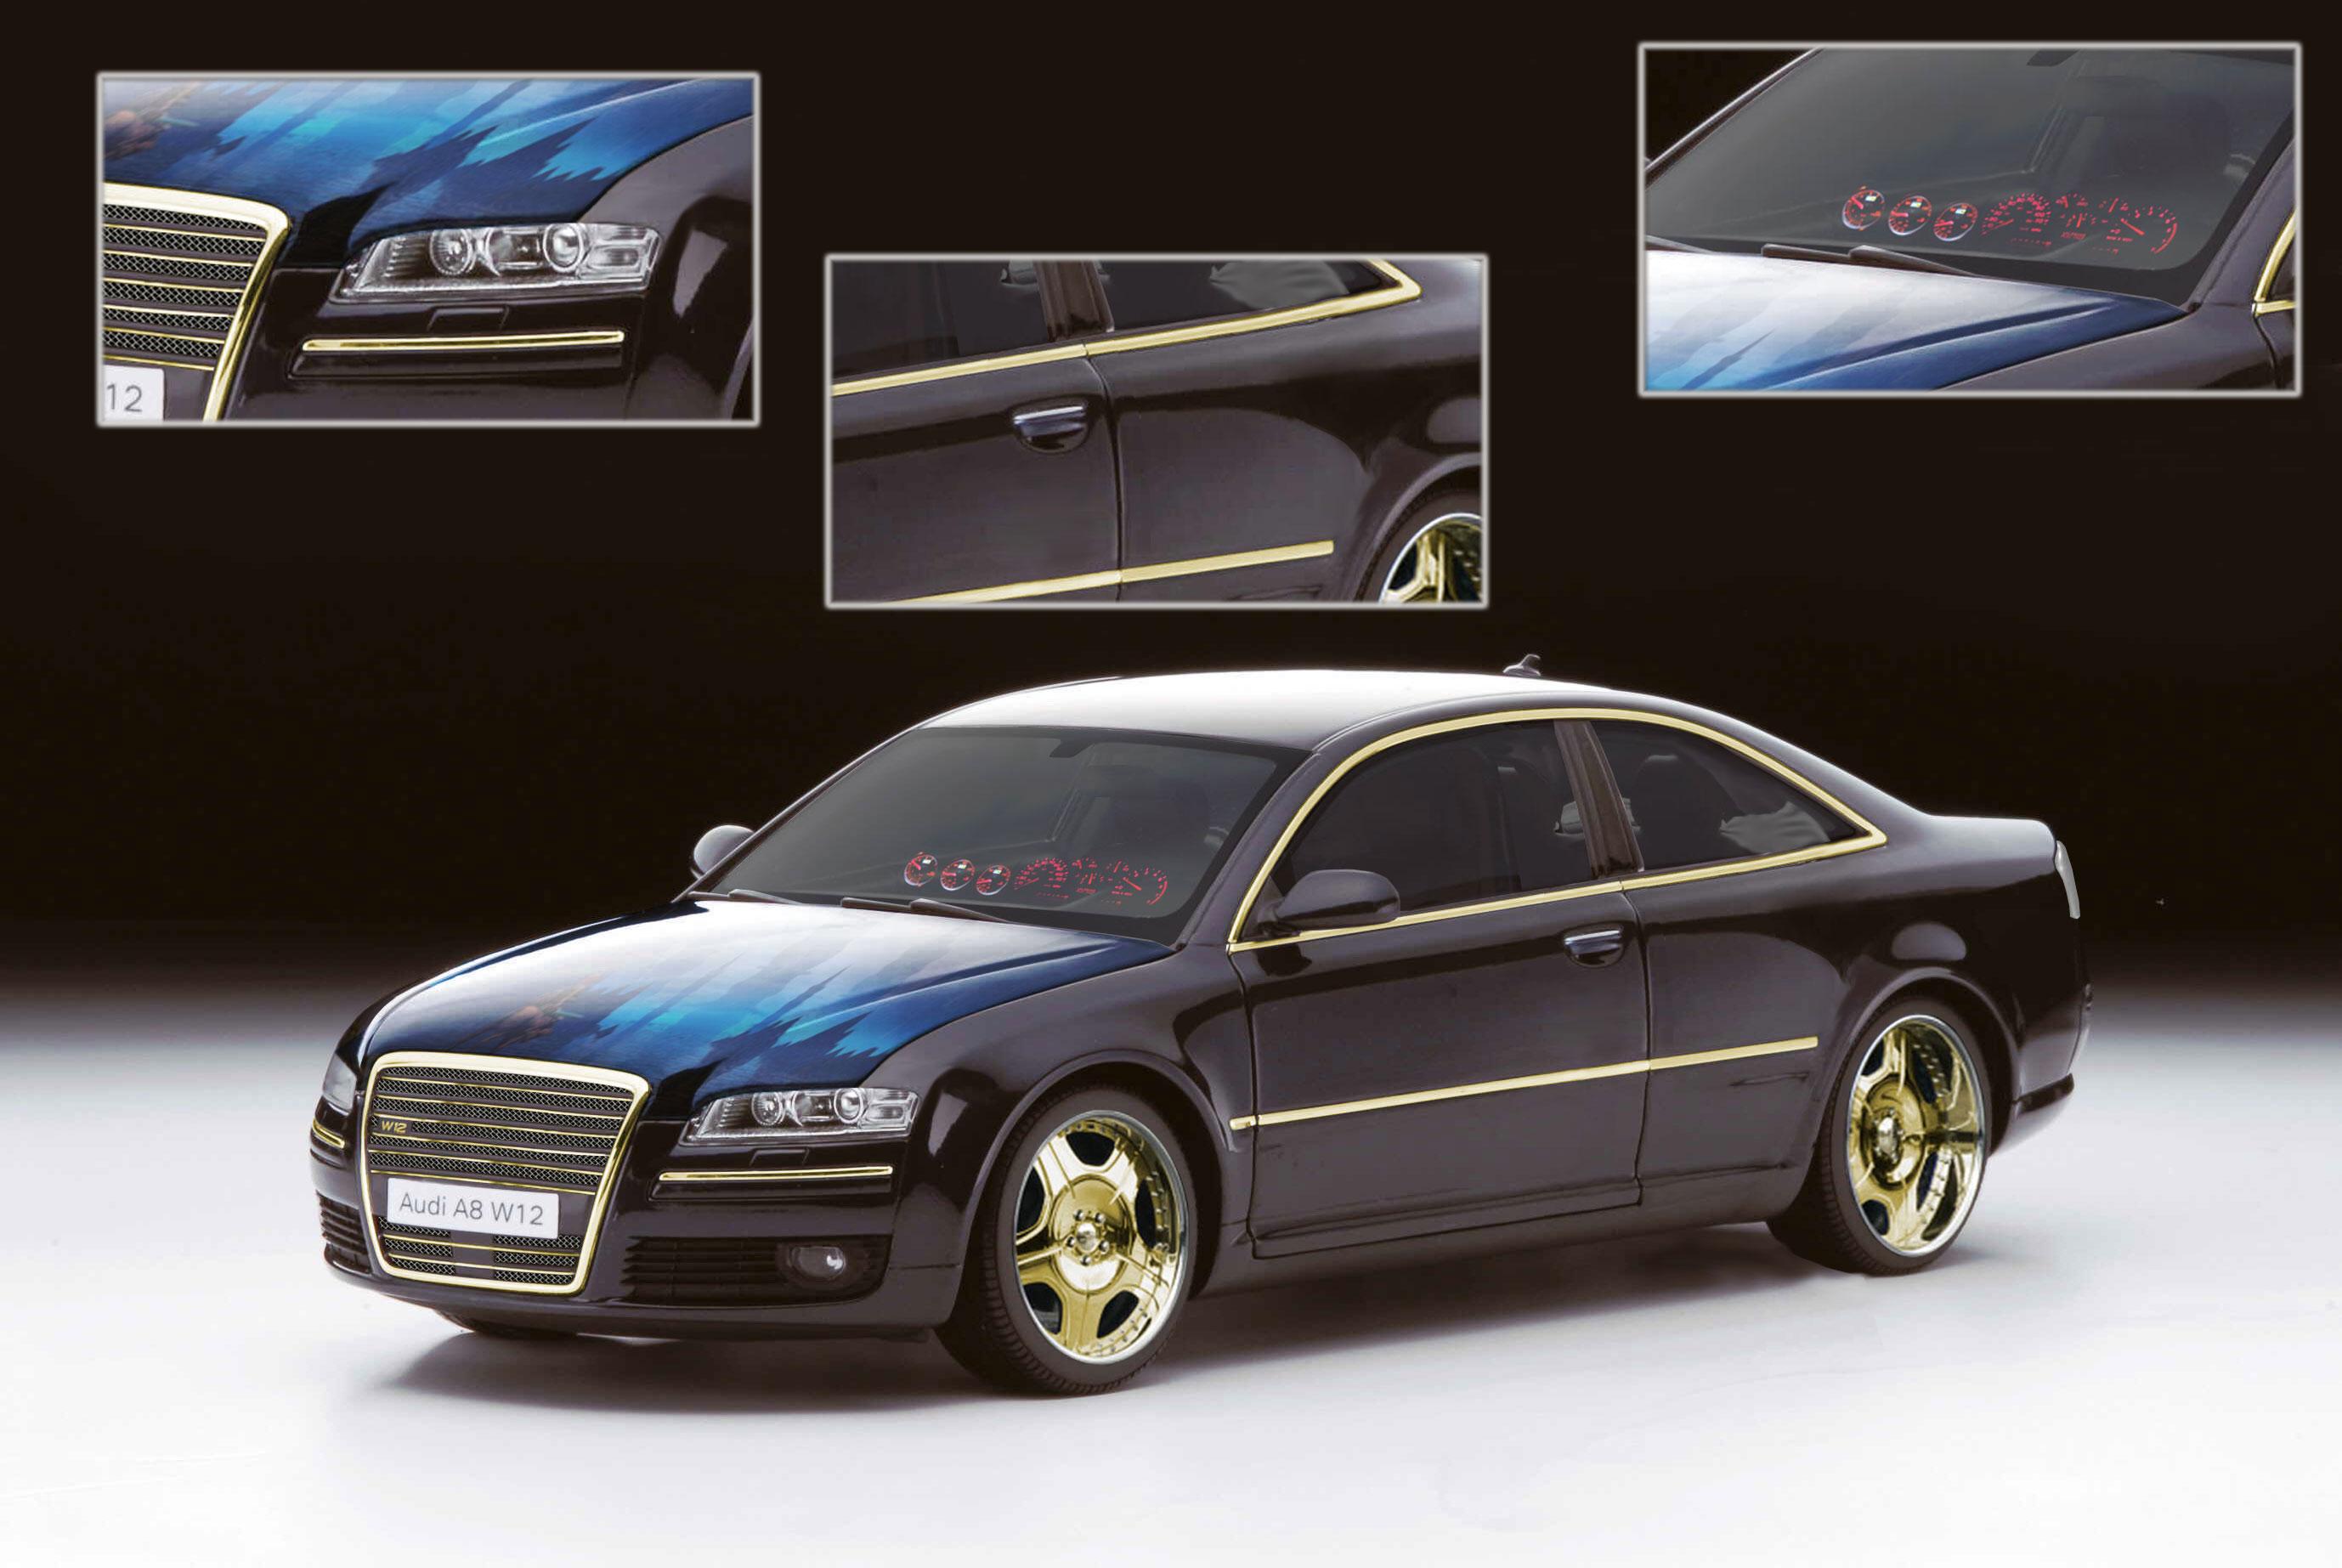 fake audi a8 w12 limo coupe deine automeile im netz. Black Bedroom Furniture Sets. Home Design Ideas